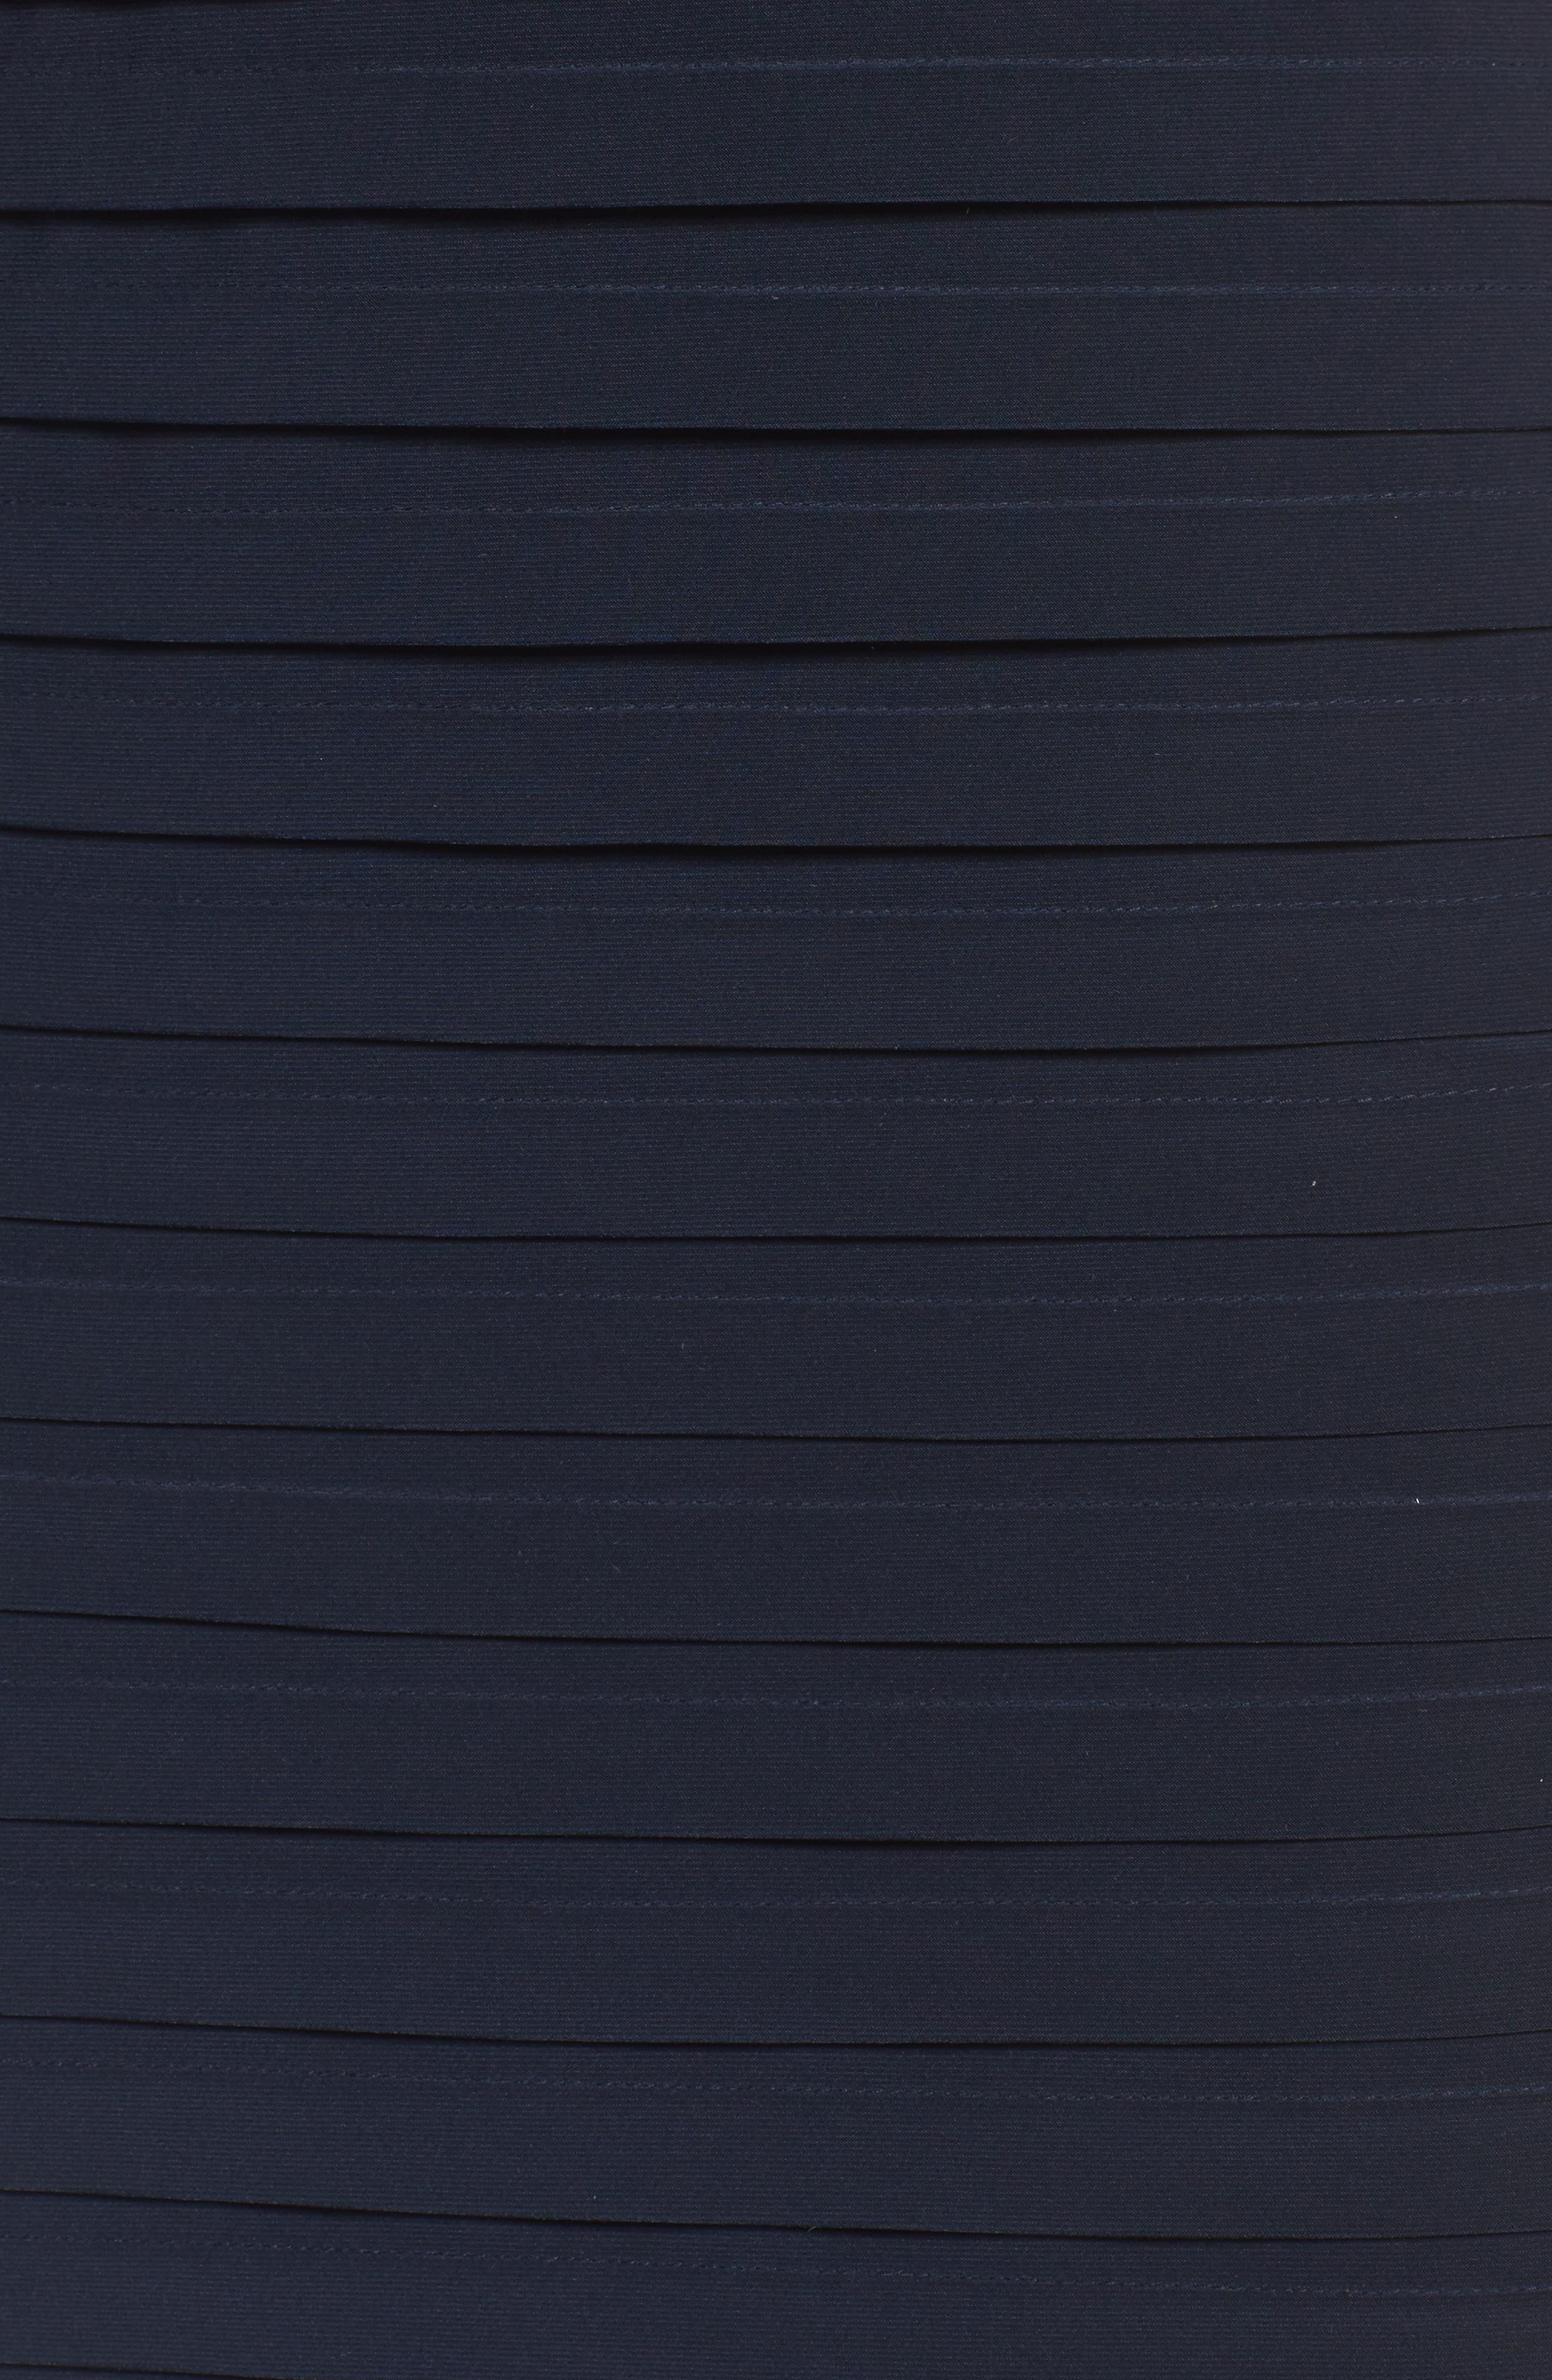 Pleat Sheath Dress,                             Alternate thumbnail 5, color,